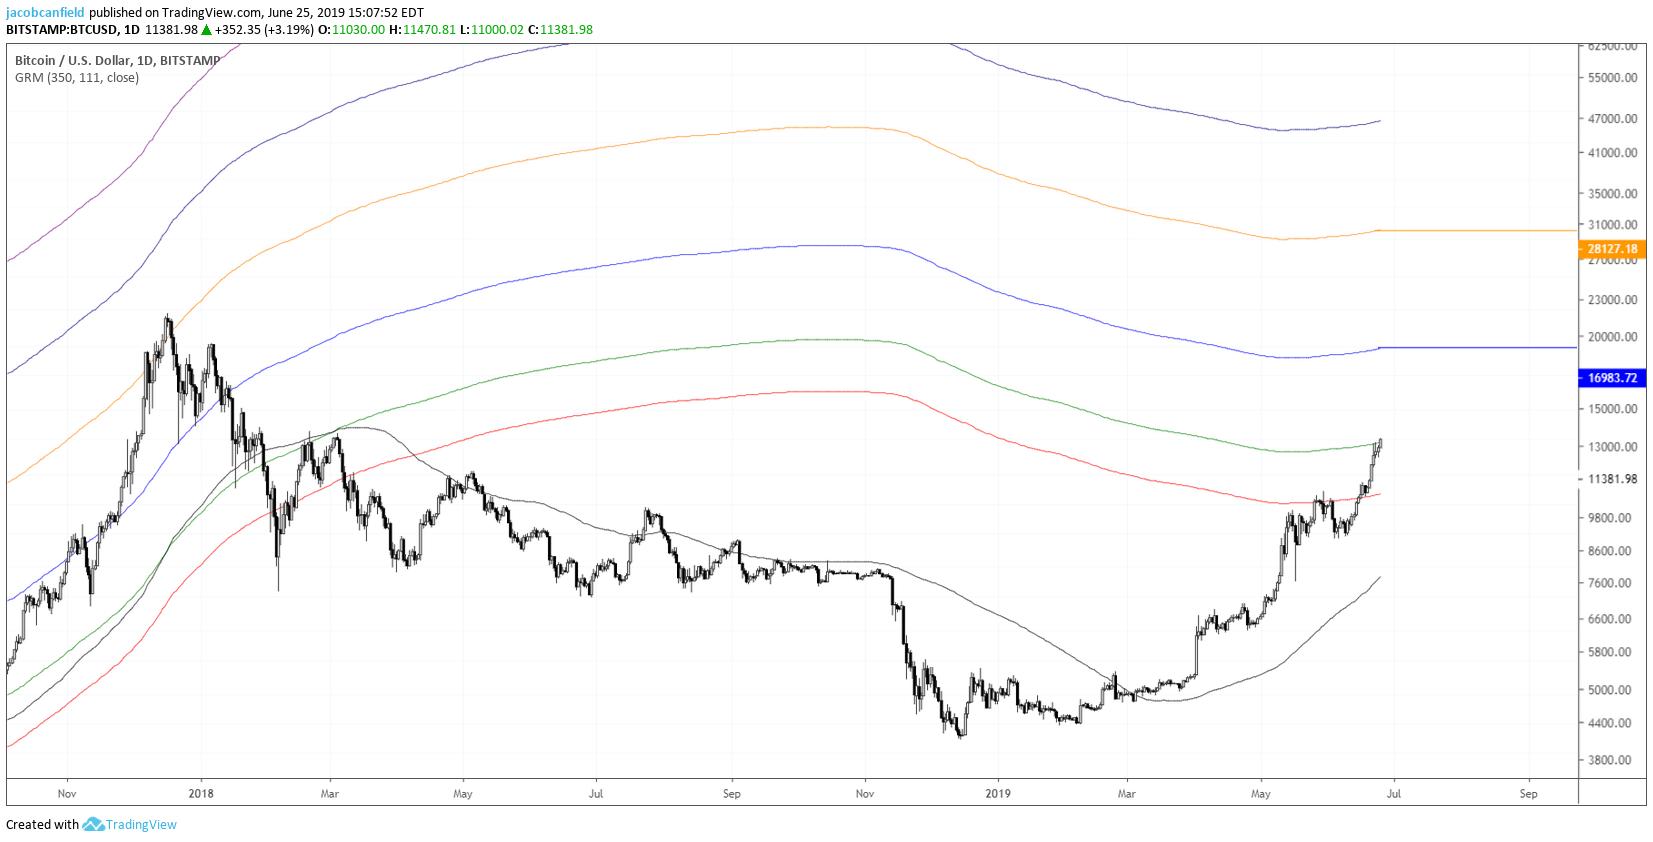 parabola-bitcoin-traderviet1.